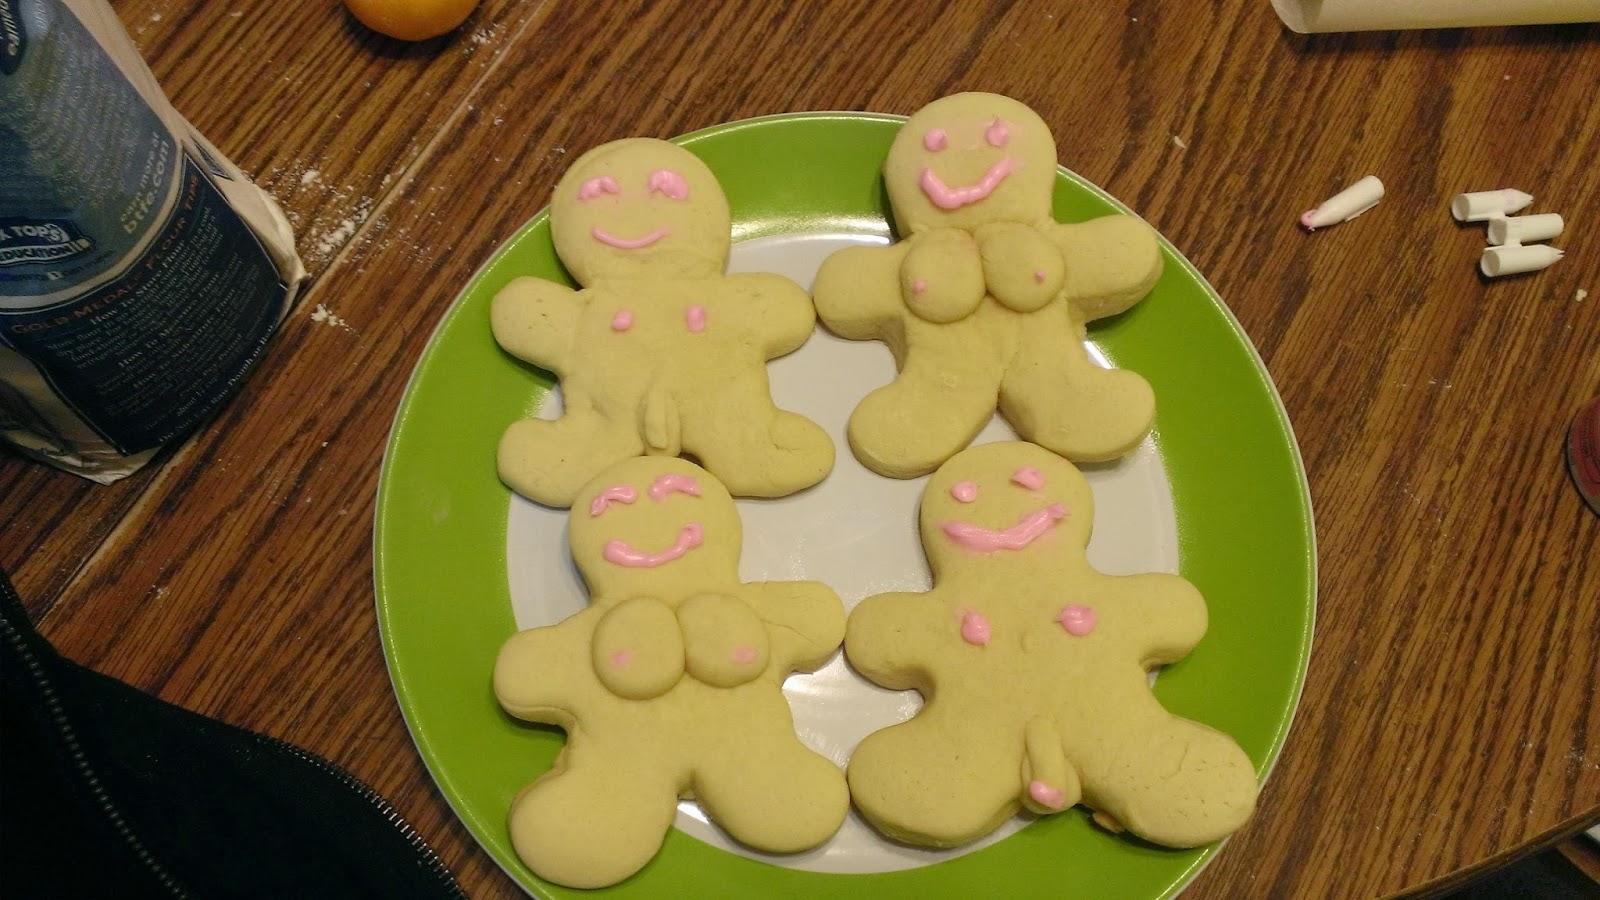 Thinking Naked: Nudist Christmas Cookies!